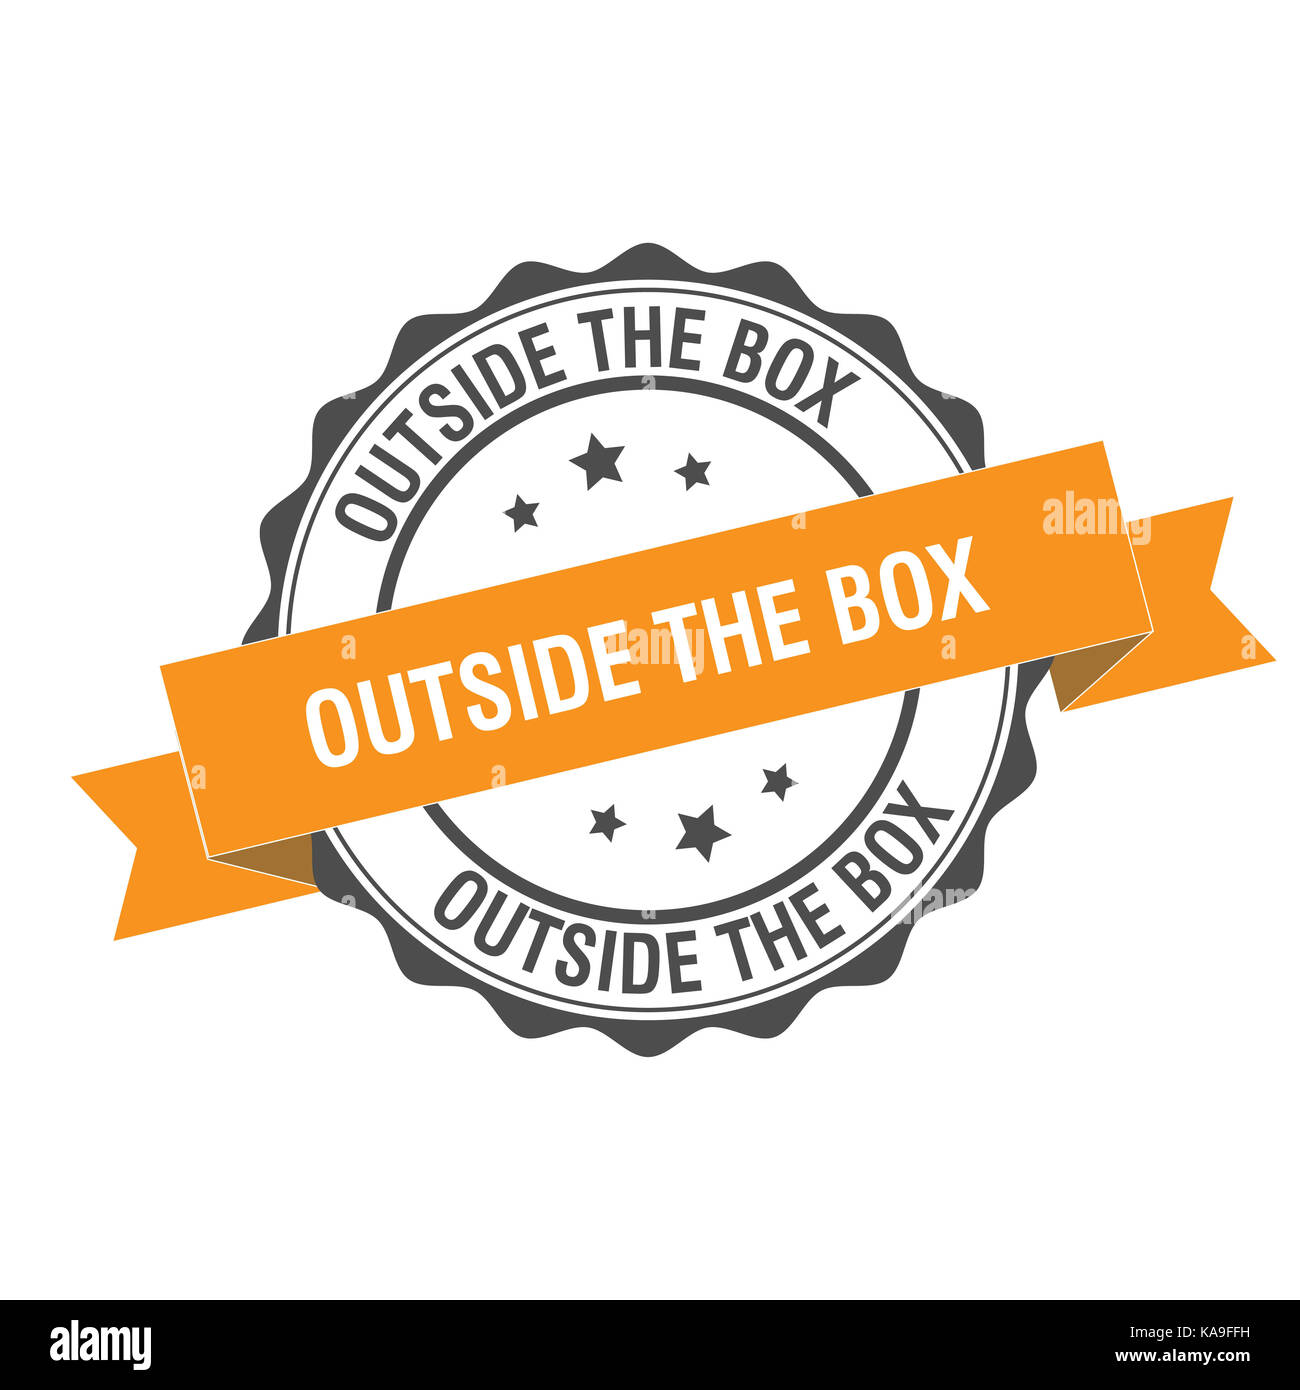 Outside the box stamp illustration - Stock Image